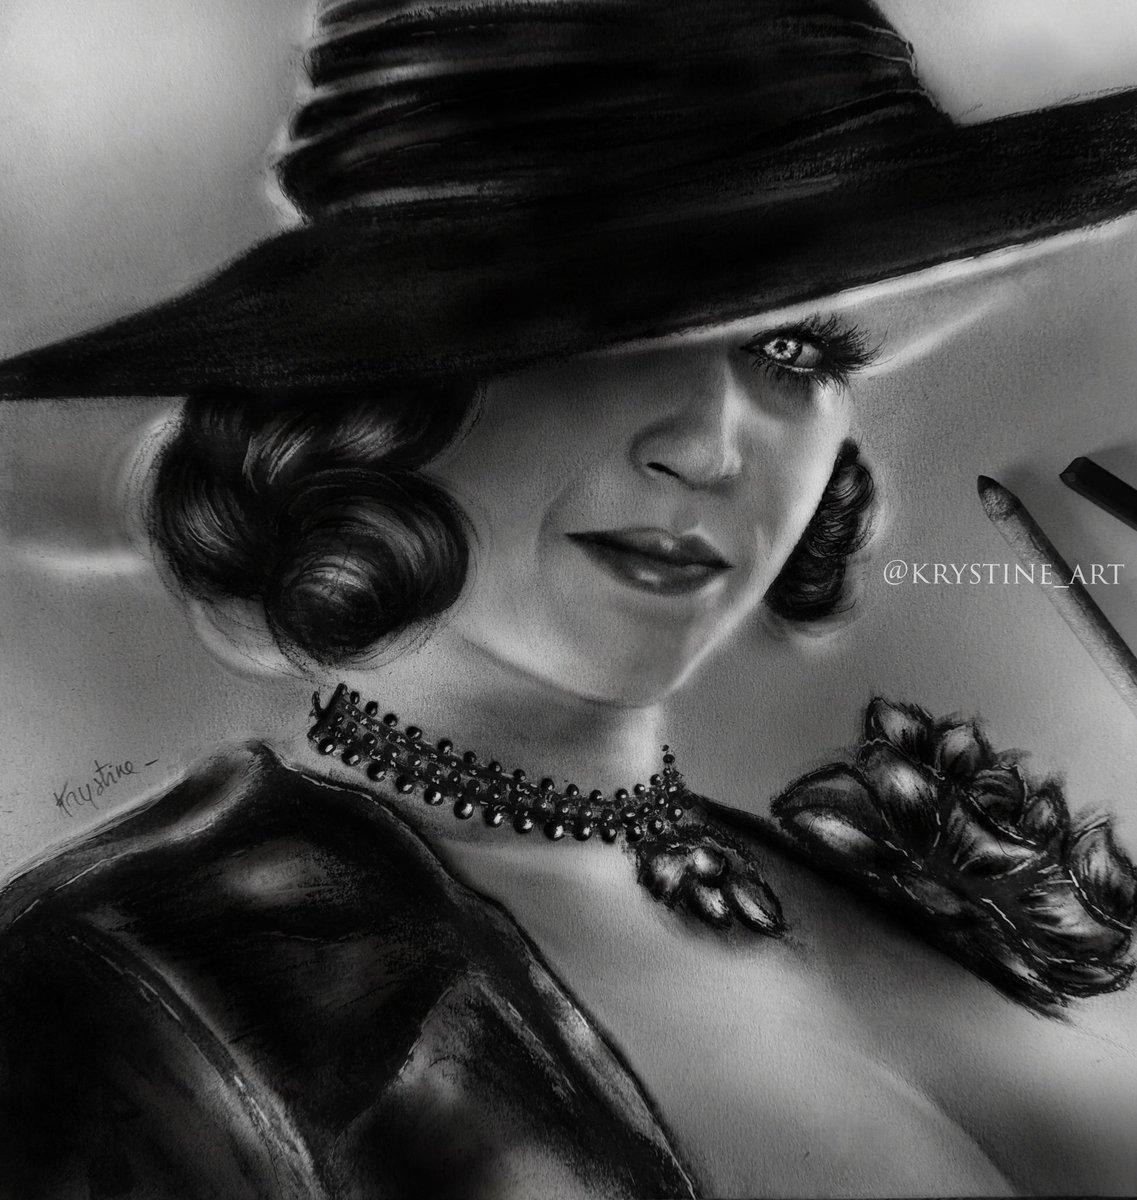 Drawing - Cosplay 🖤 #LadyDimitrescu   #ResidentEvilVillage https://t.co/4DRIcc37Lf